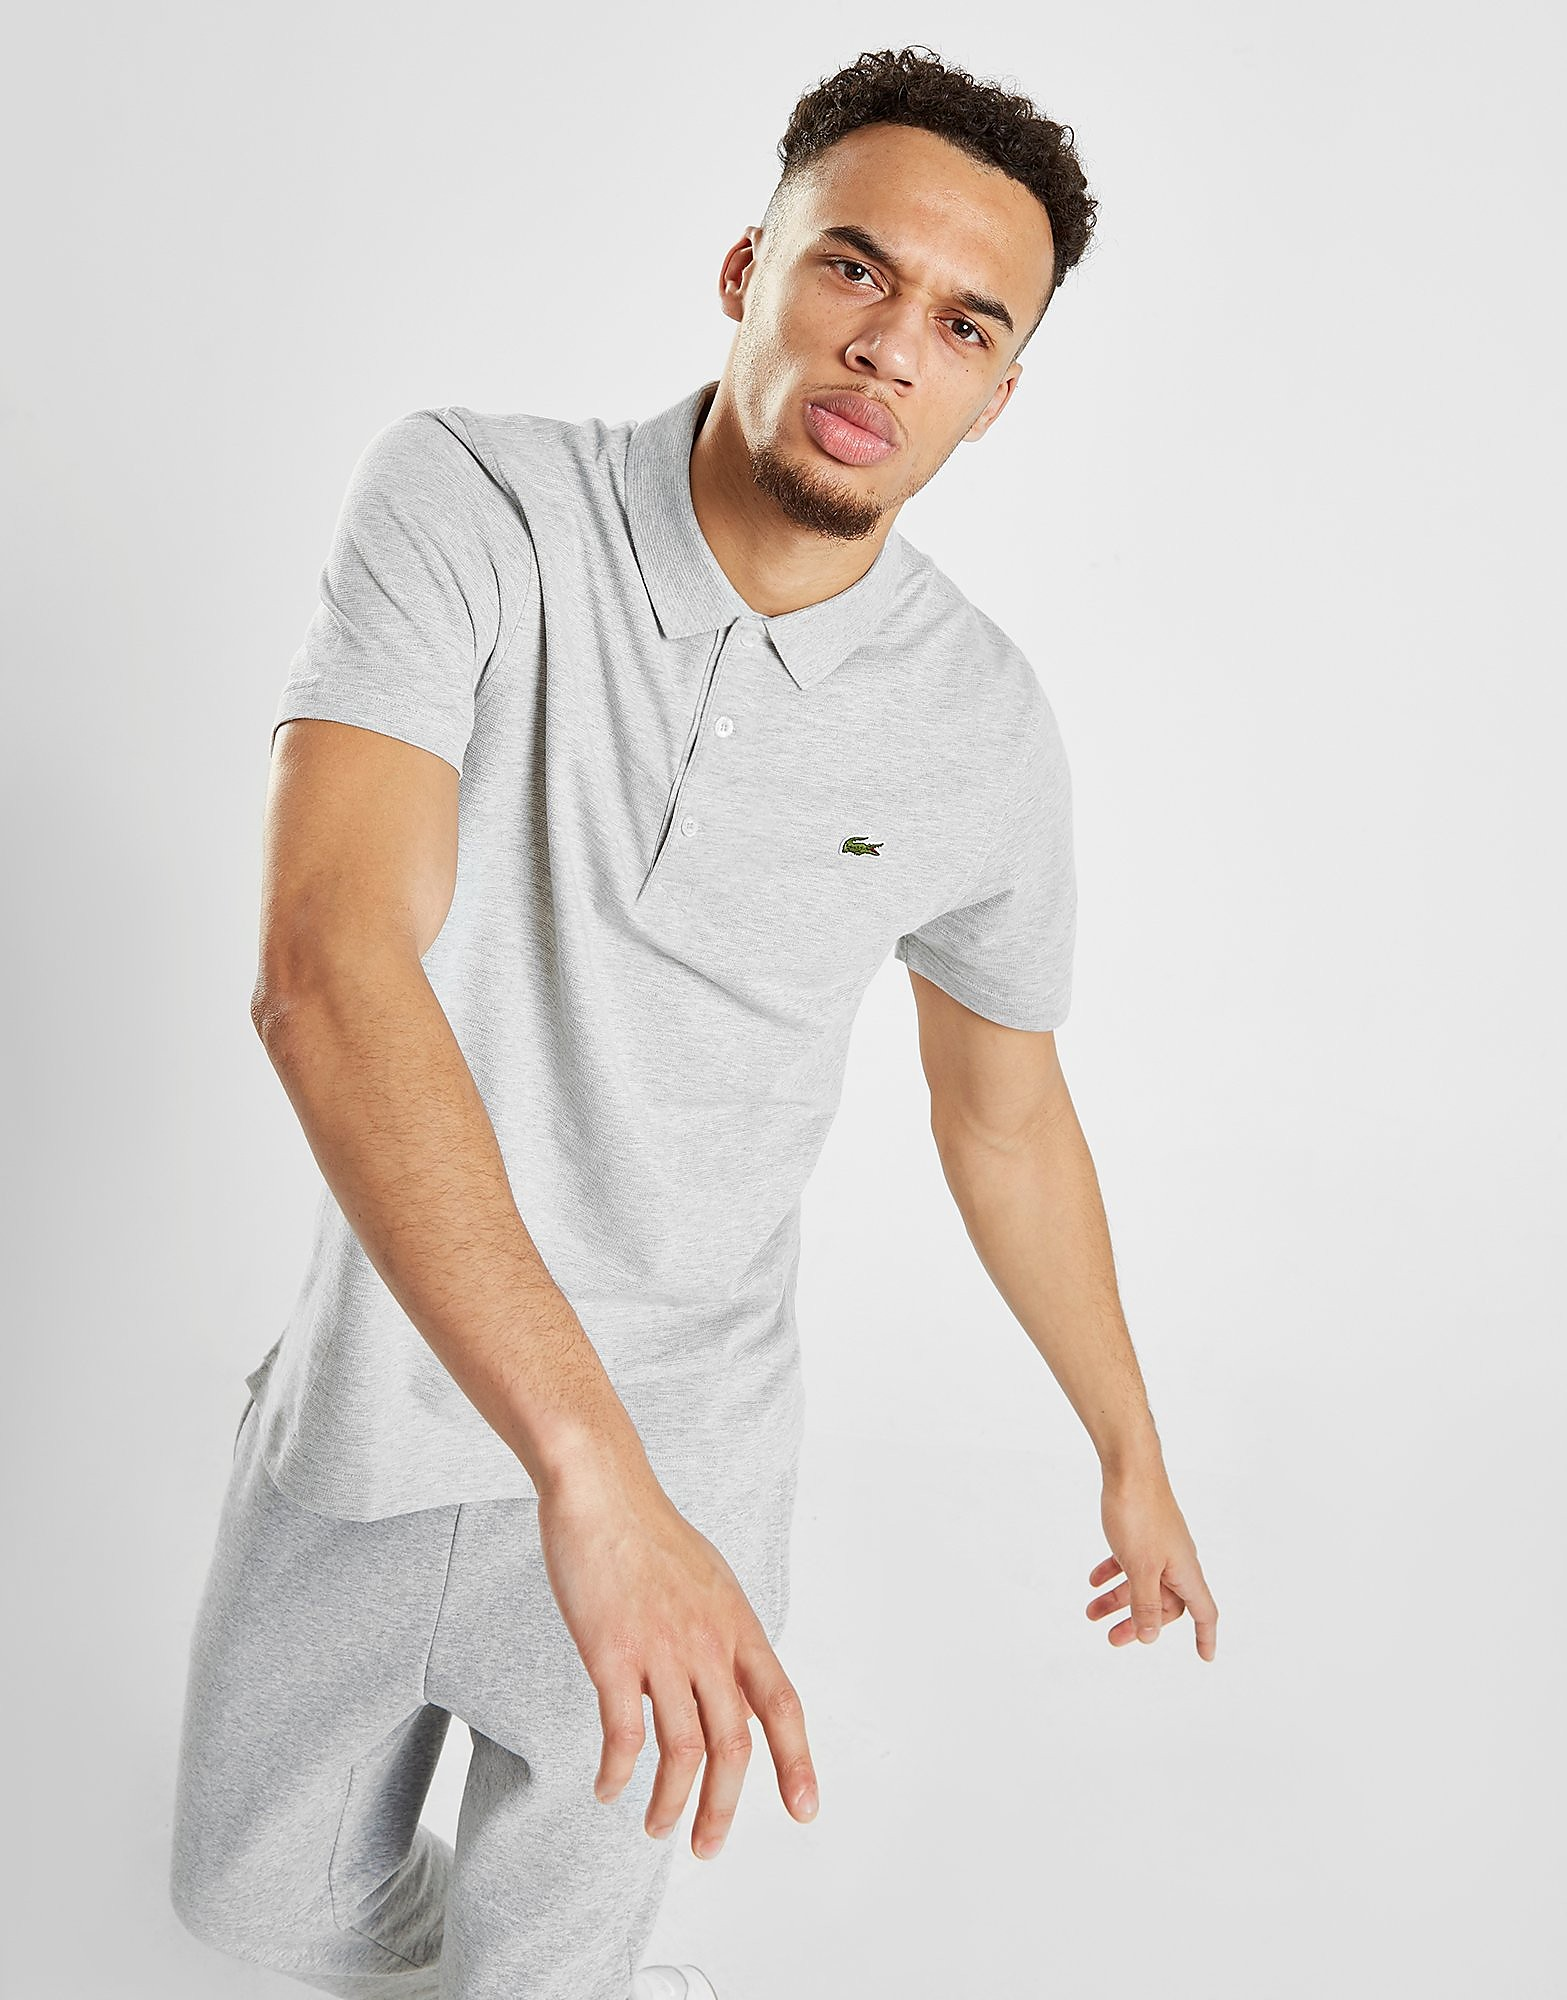 Lacoste Alligator Short Sleeve Polo Shirt - Grijs - Heren